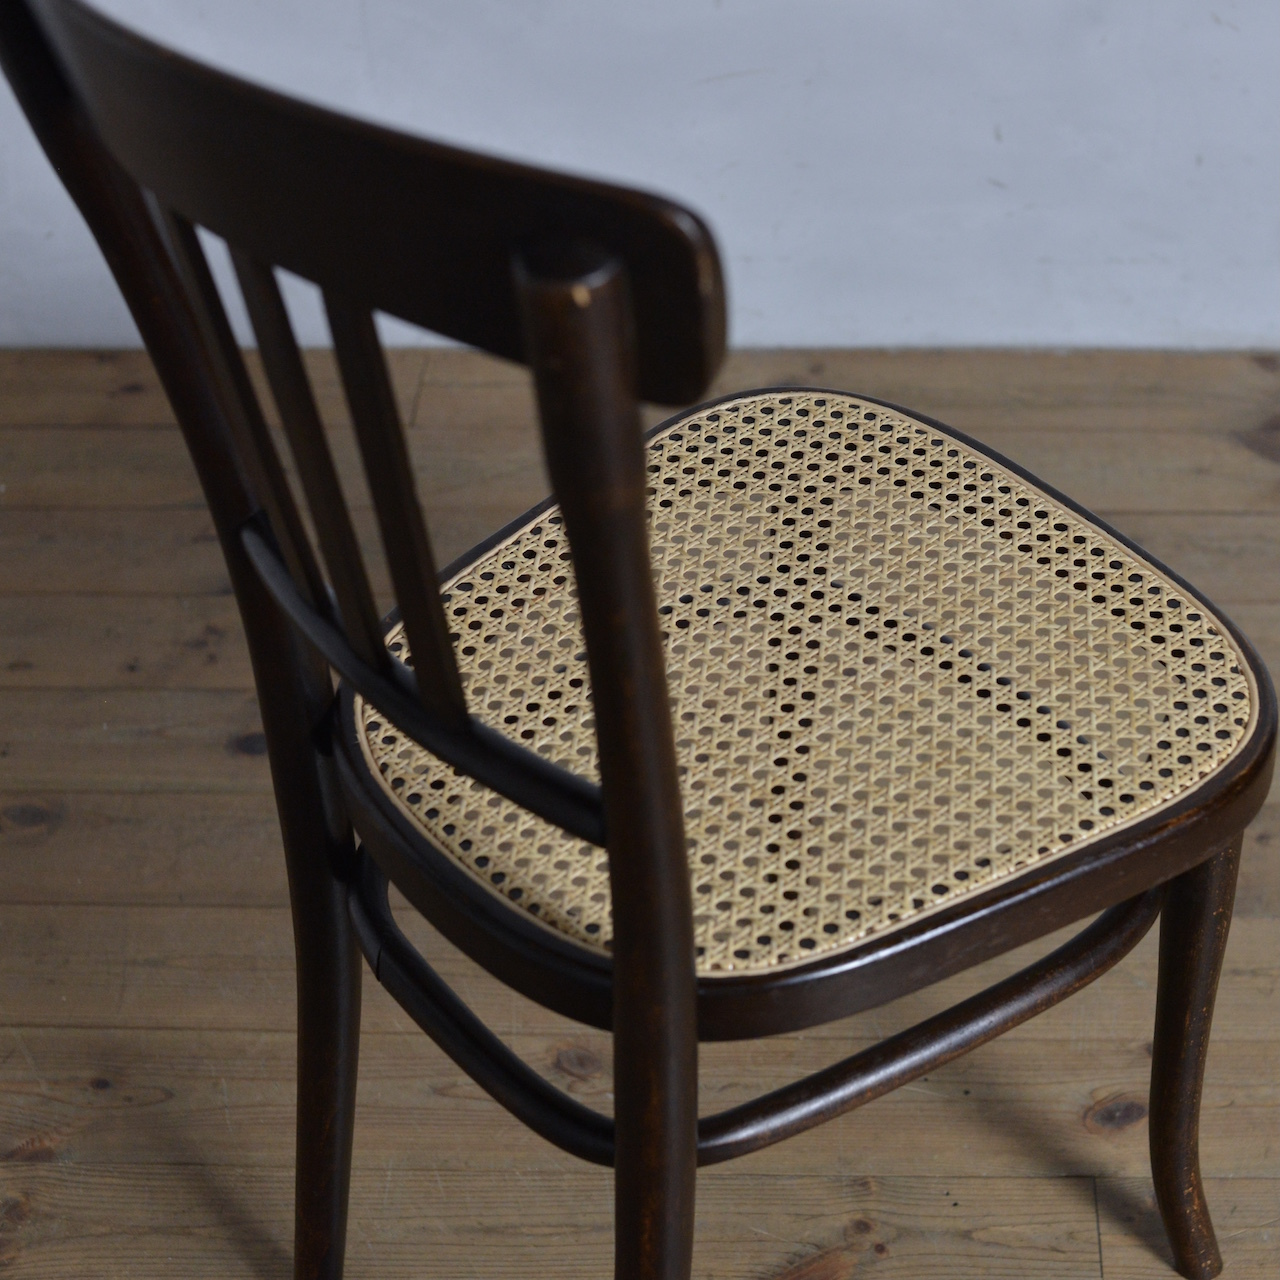 Thonet Bentwood Chair / トーネット ベントウッド チェア【A】〈トーネット社・ミヒャエルトーネット・ラタンチェア・ダイニングチェア〉2806-0275 【A】